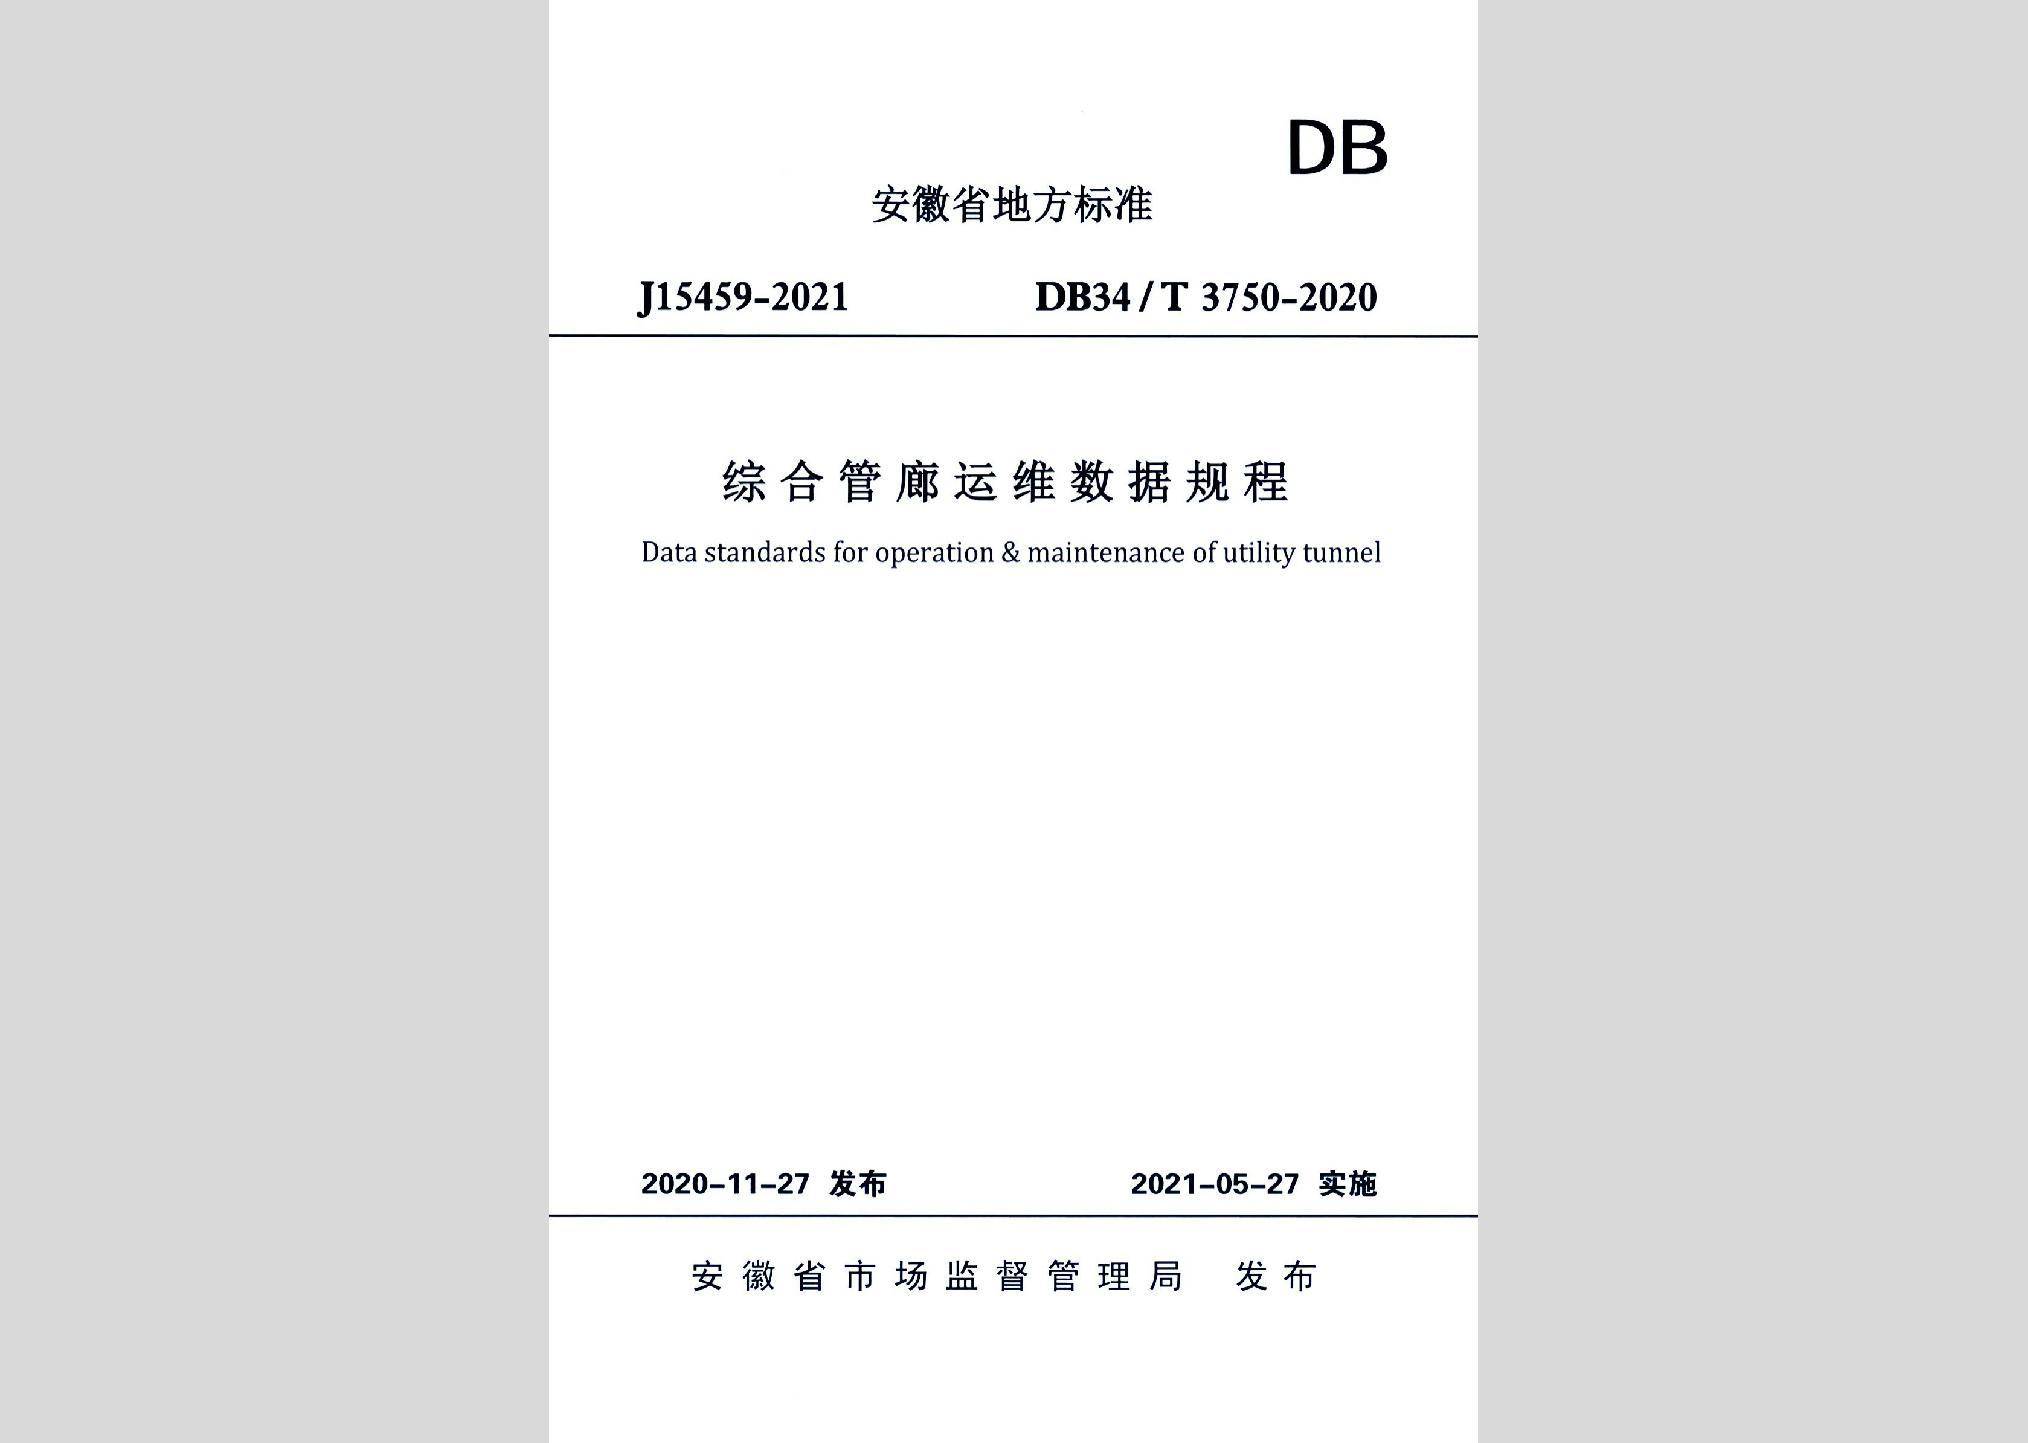 DB34/T3750-2020:综合管廊运维数据规程